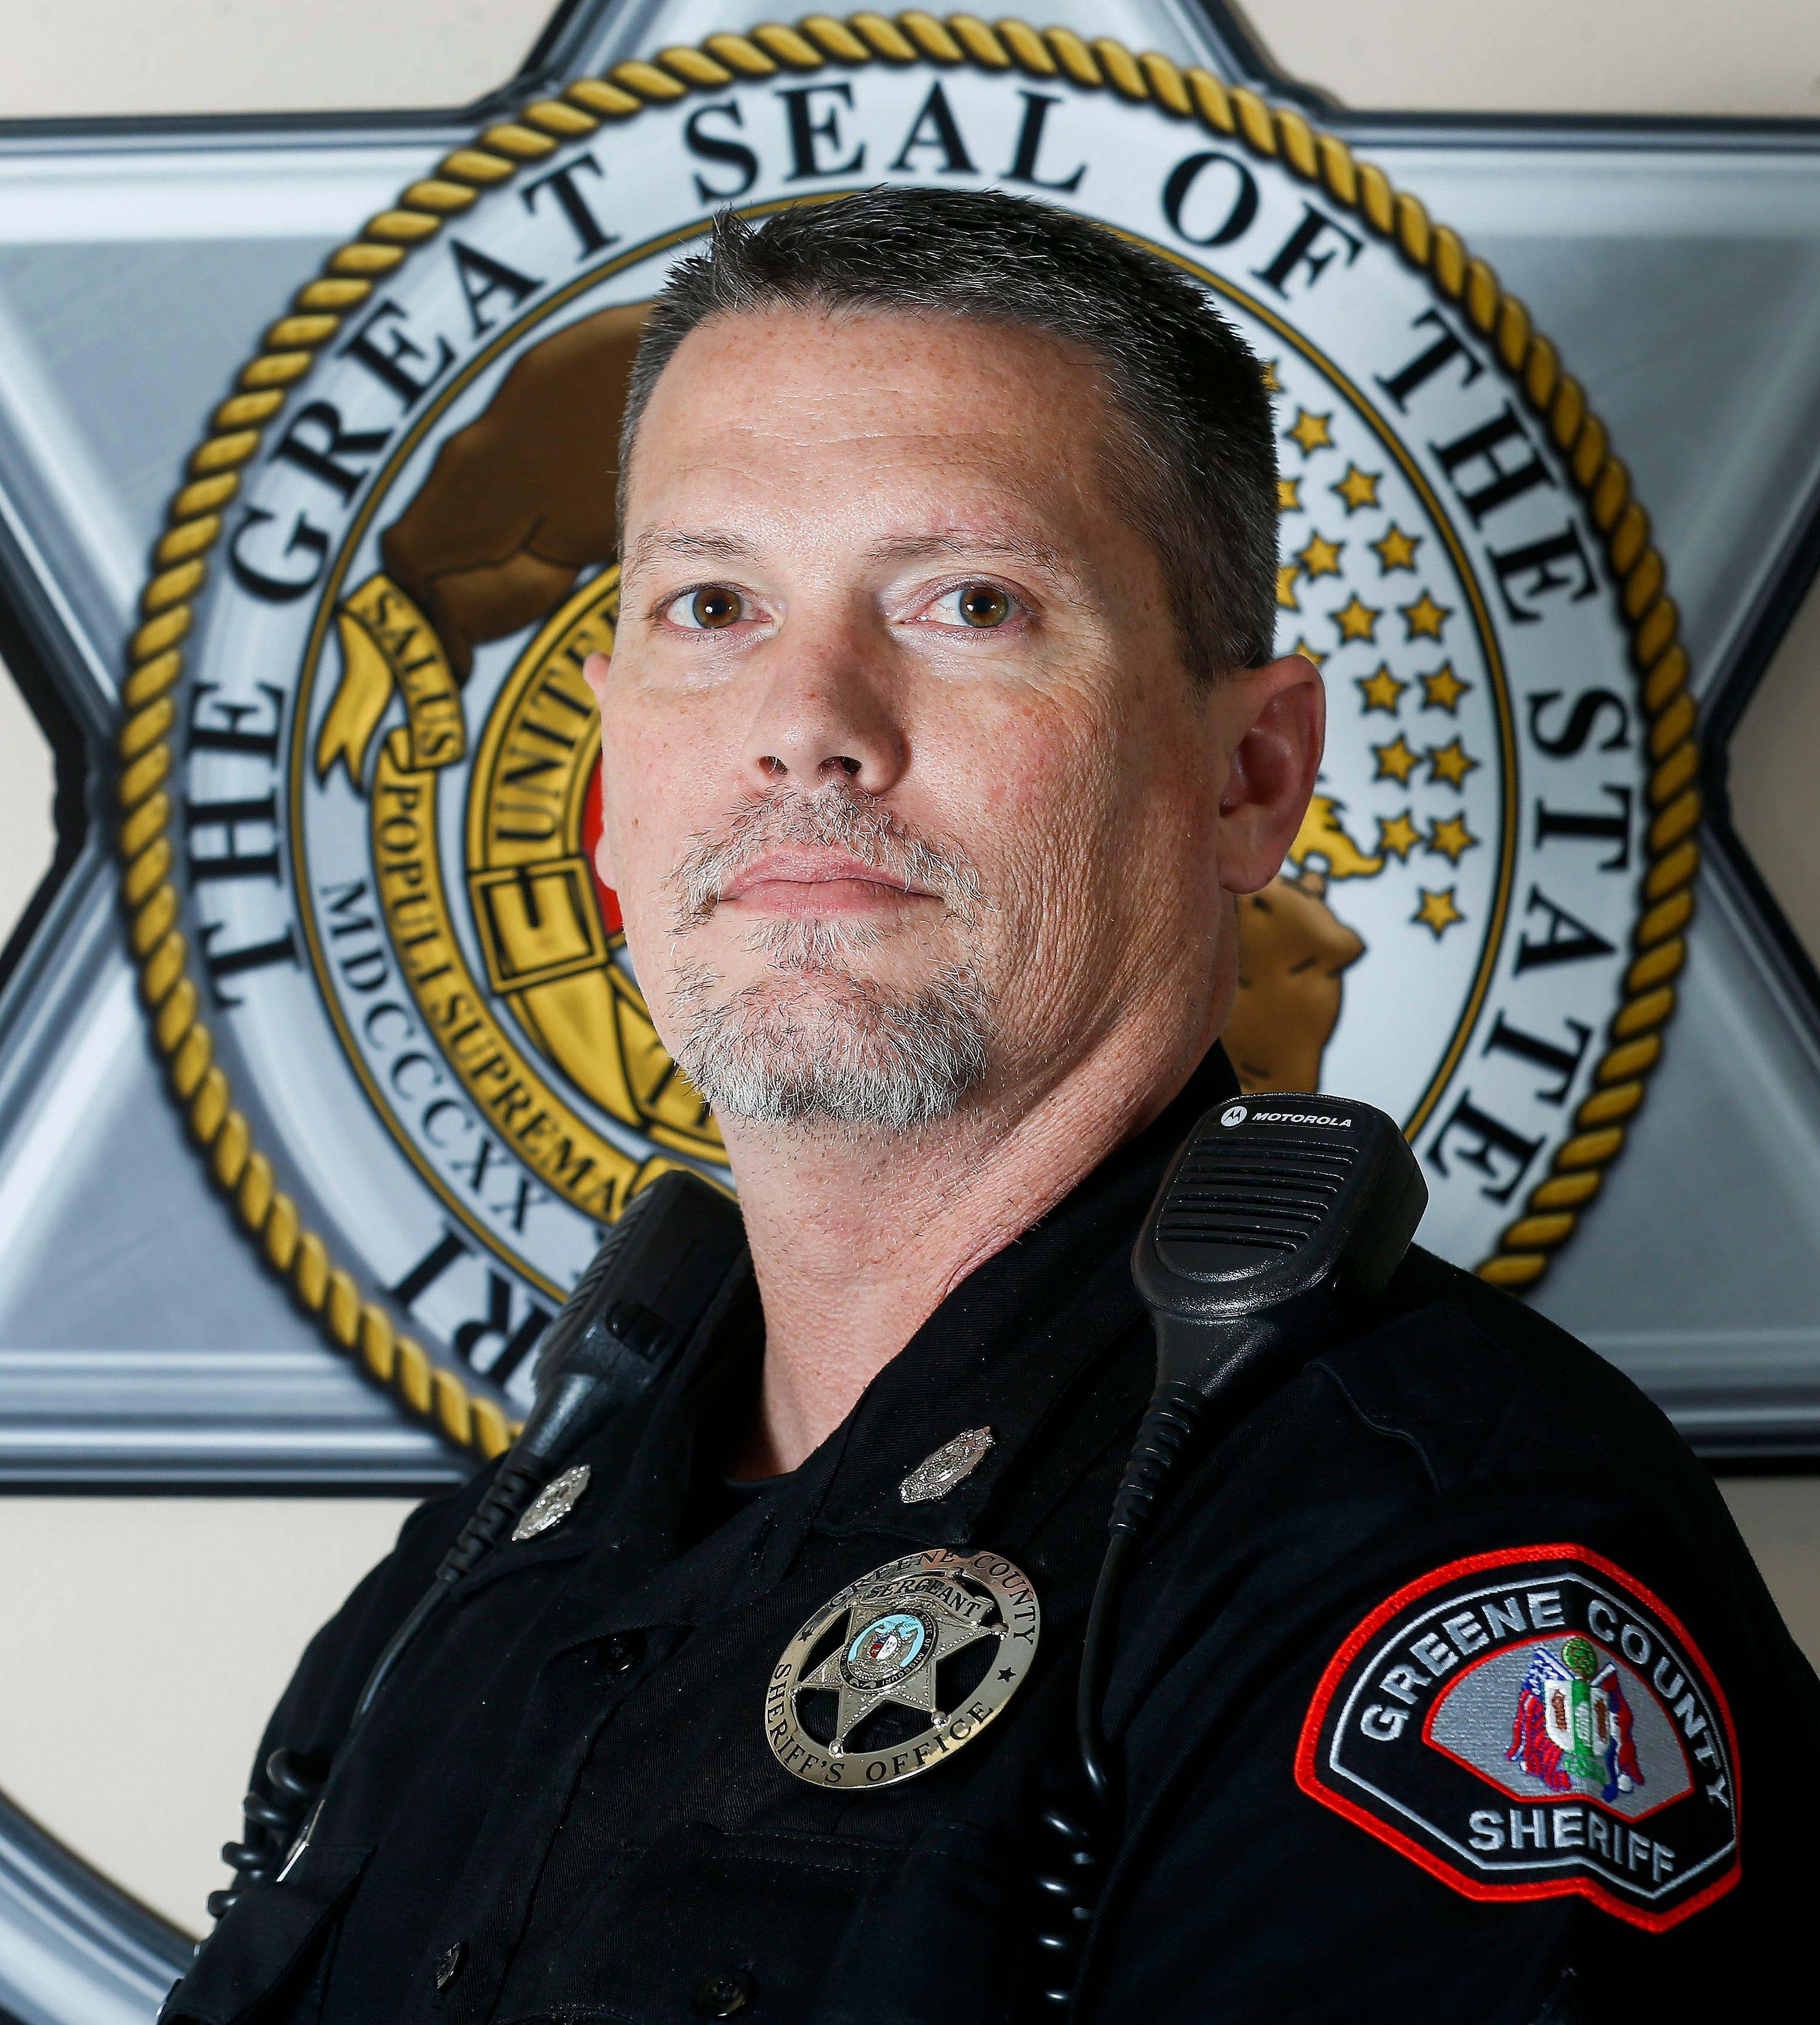 Sgt. David Carnagey